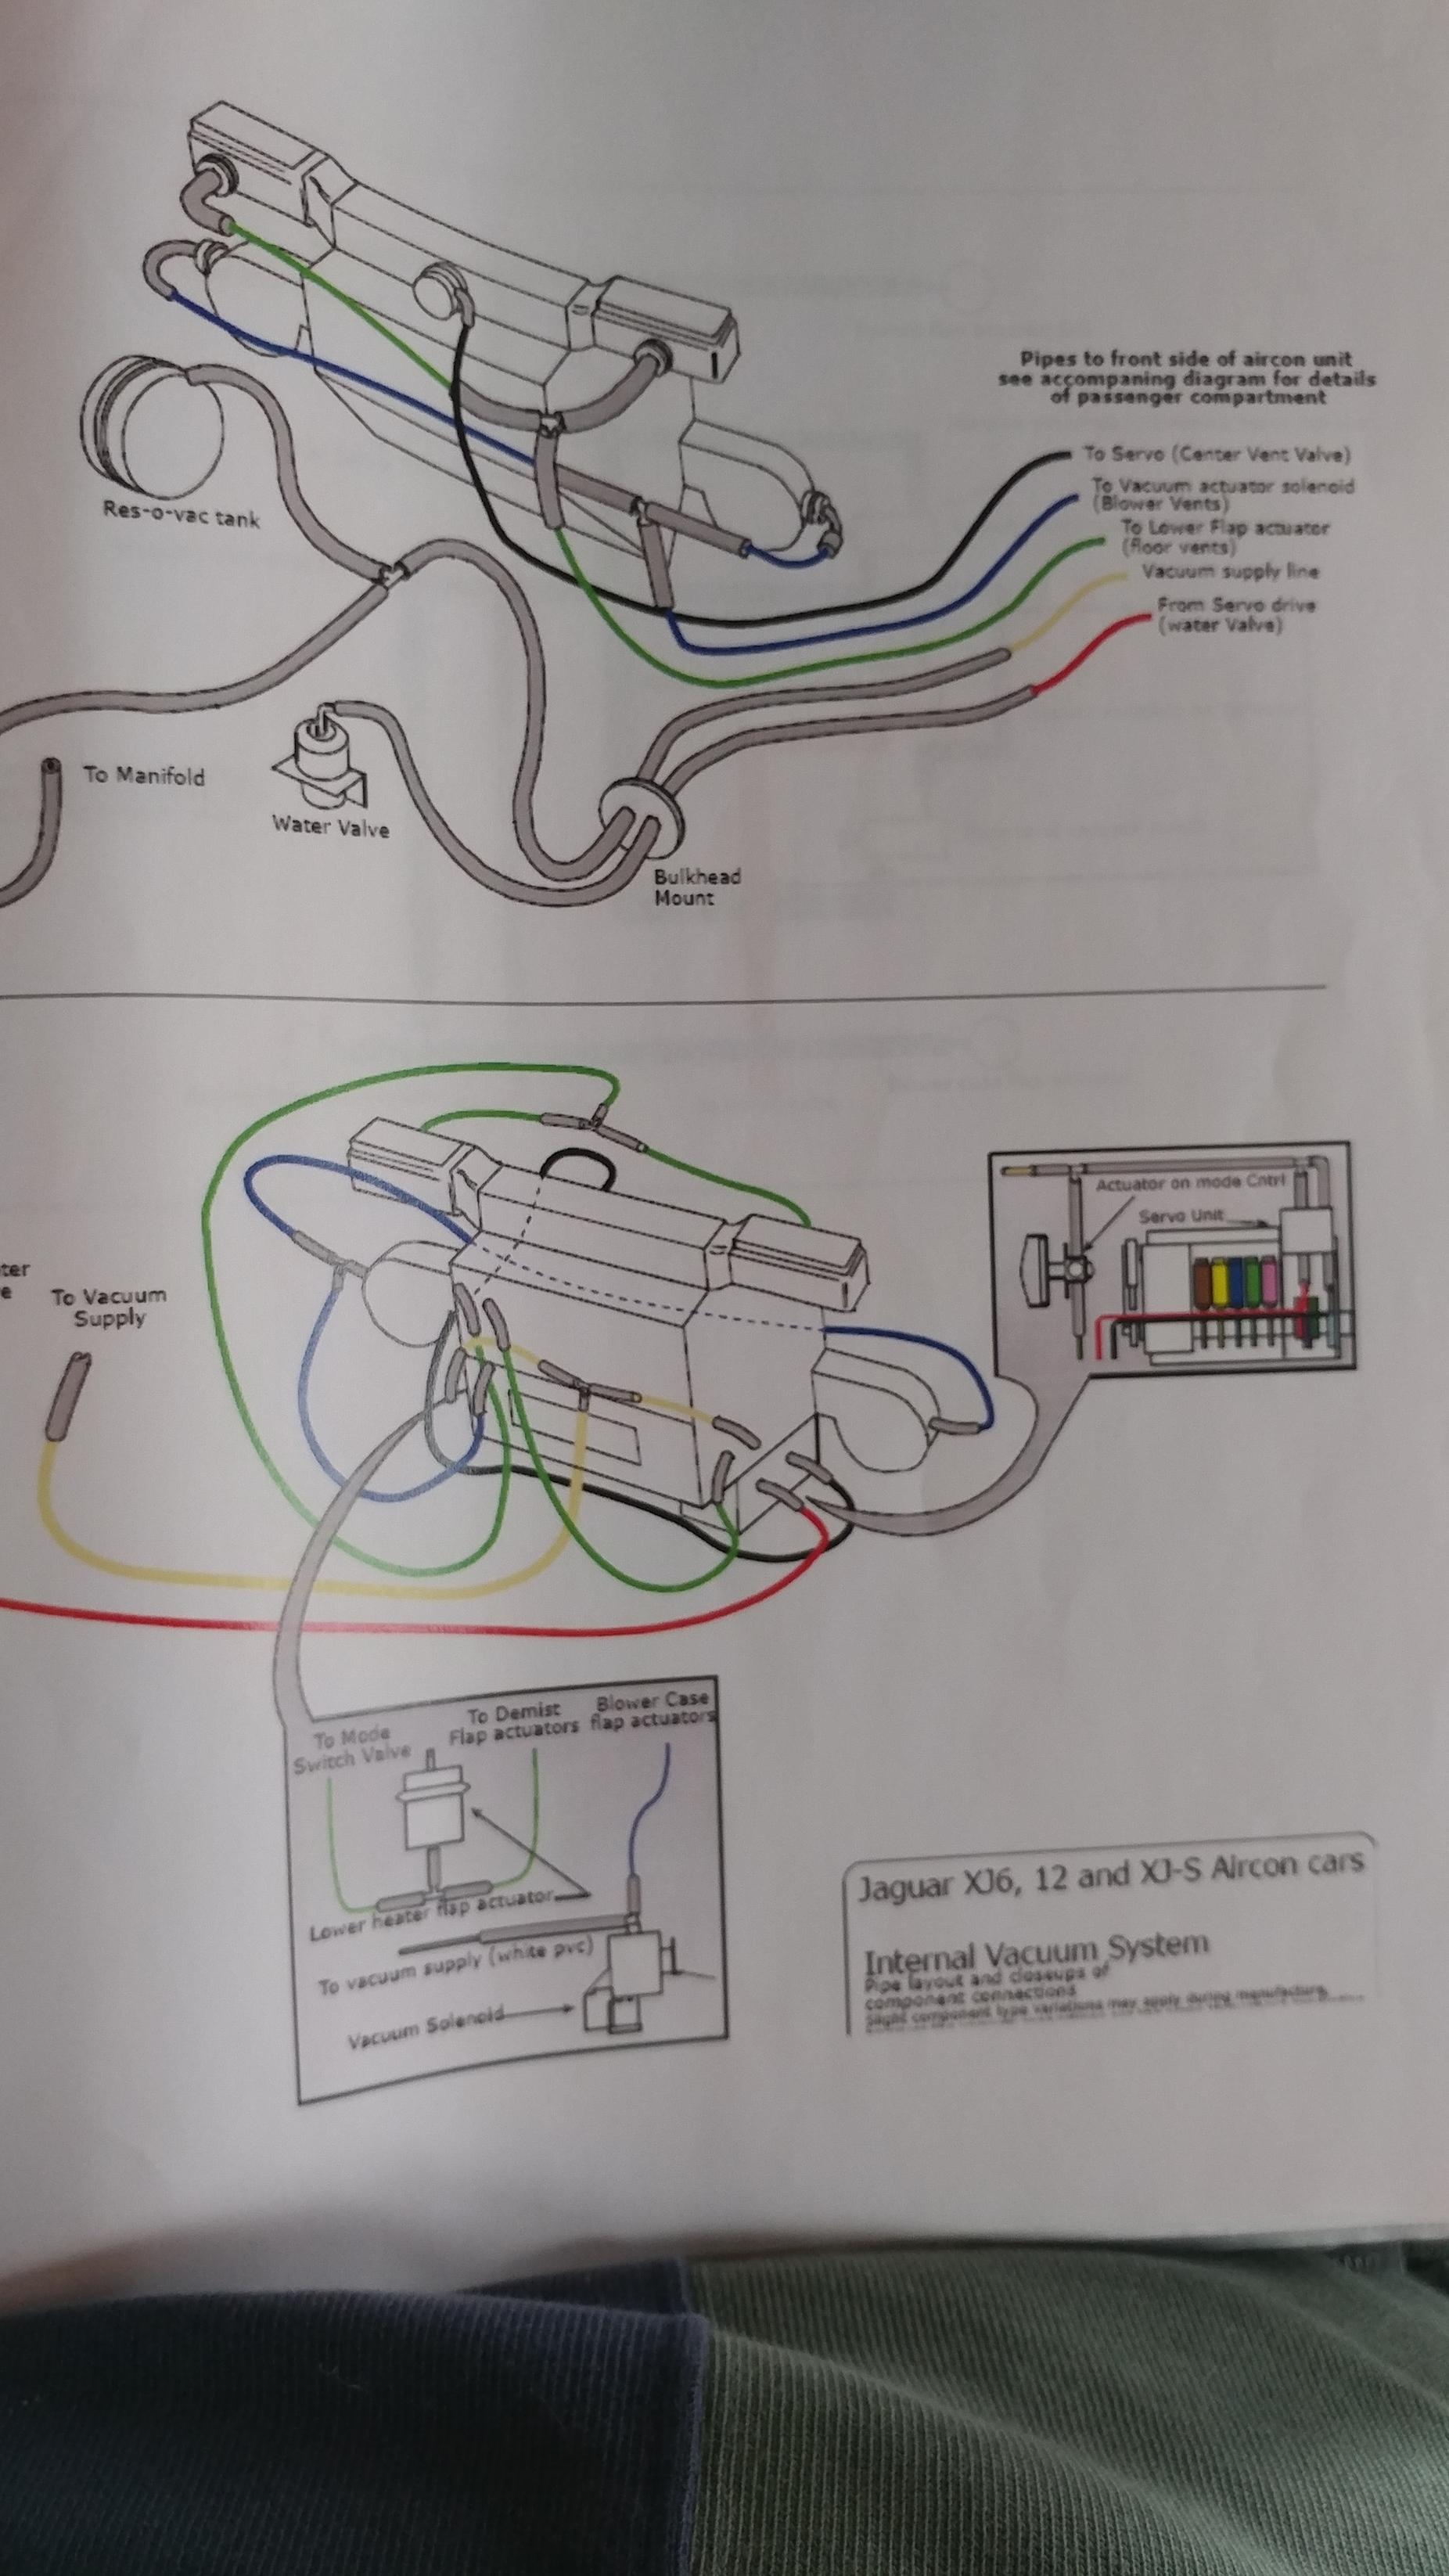 With Jaguar Xj8 Heater Hose Diagram On Jaguar Xj8 Heater Hose Diagram